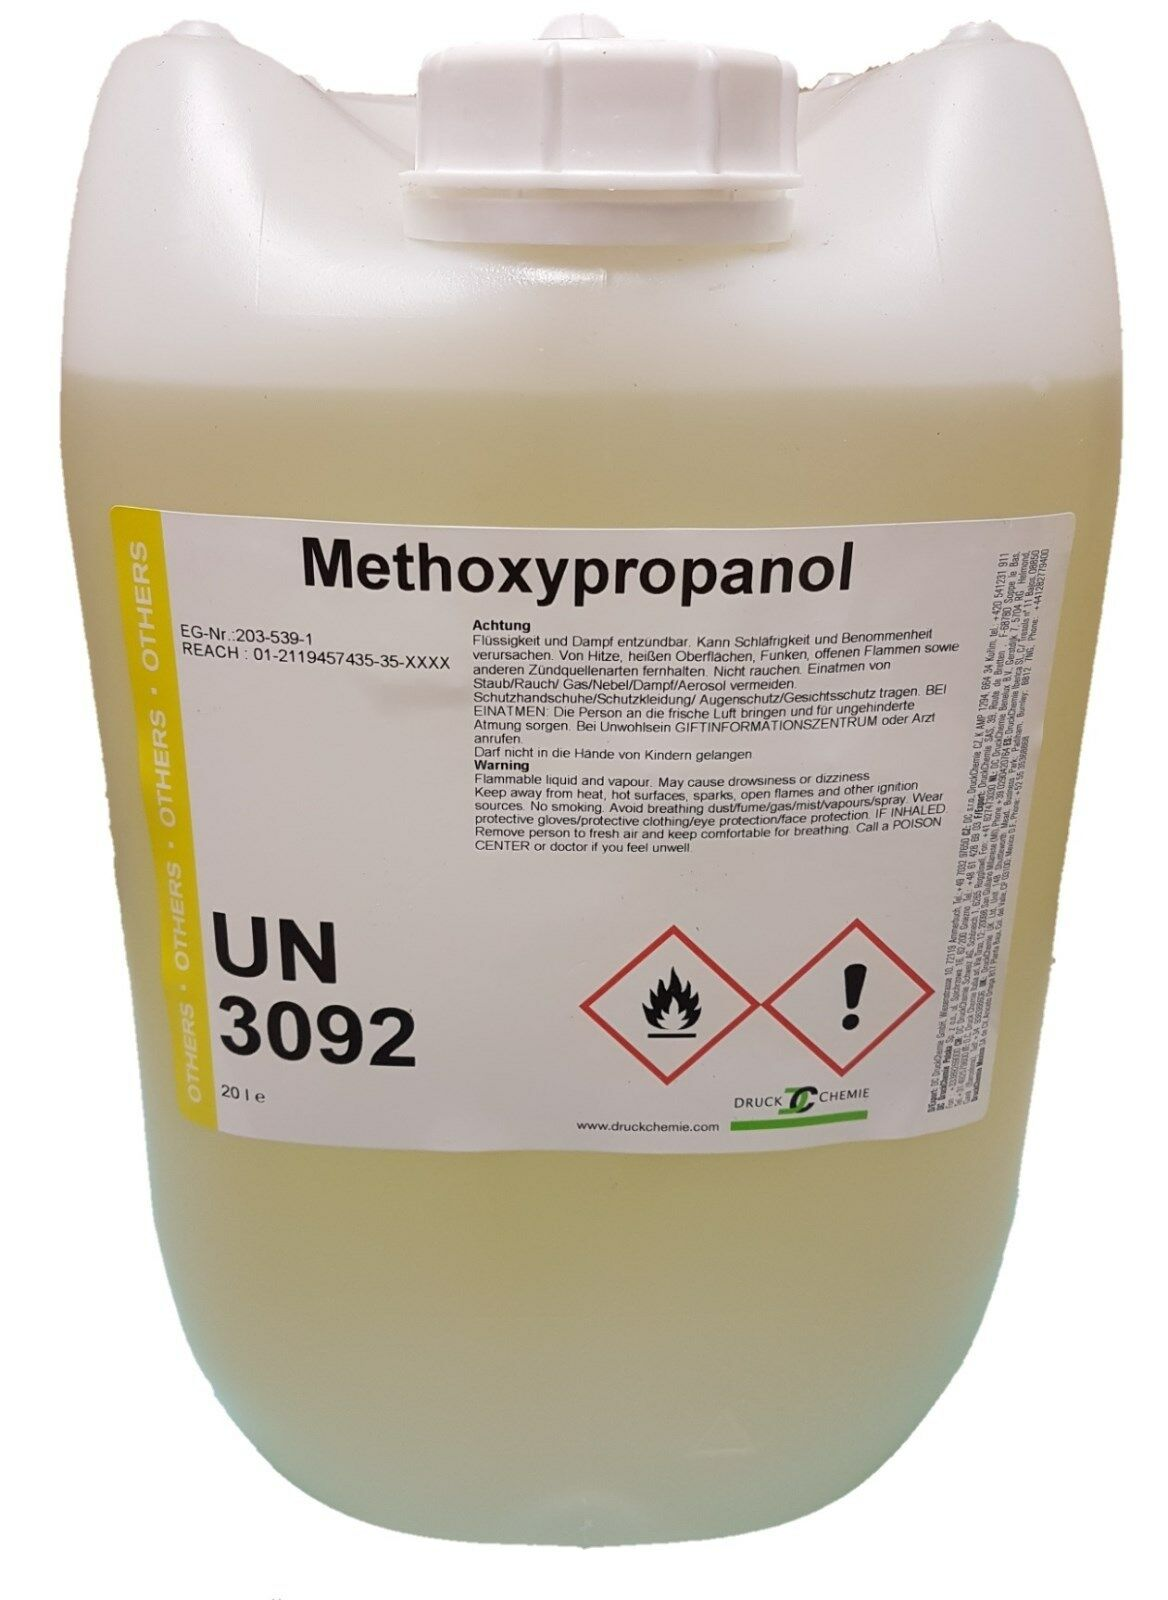 Methoxypropanol - 3x10 Liter kanister - 1-Methoxy-2-Propanol